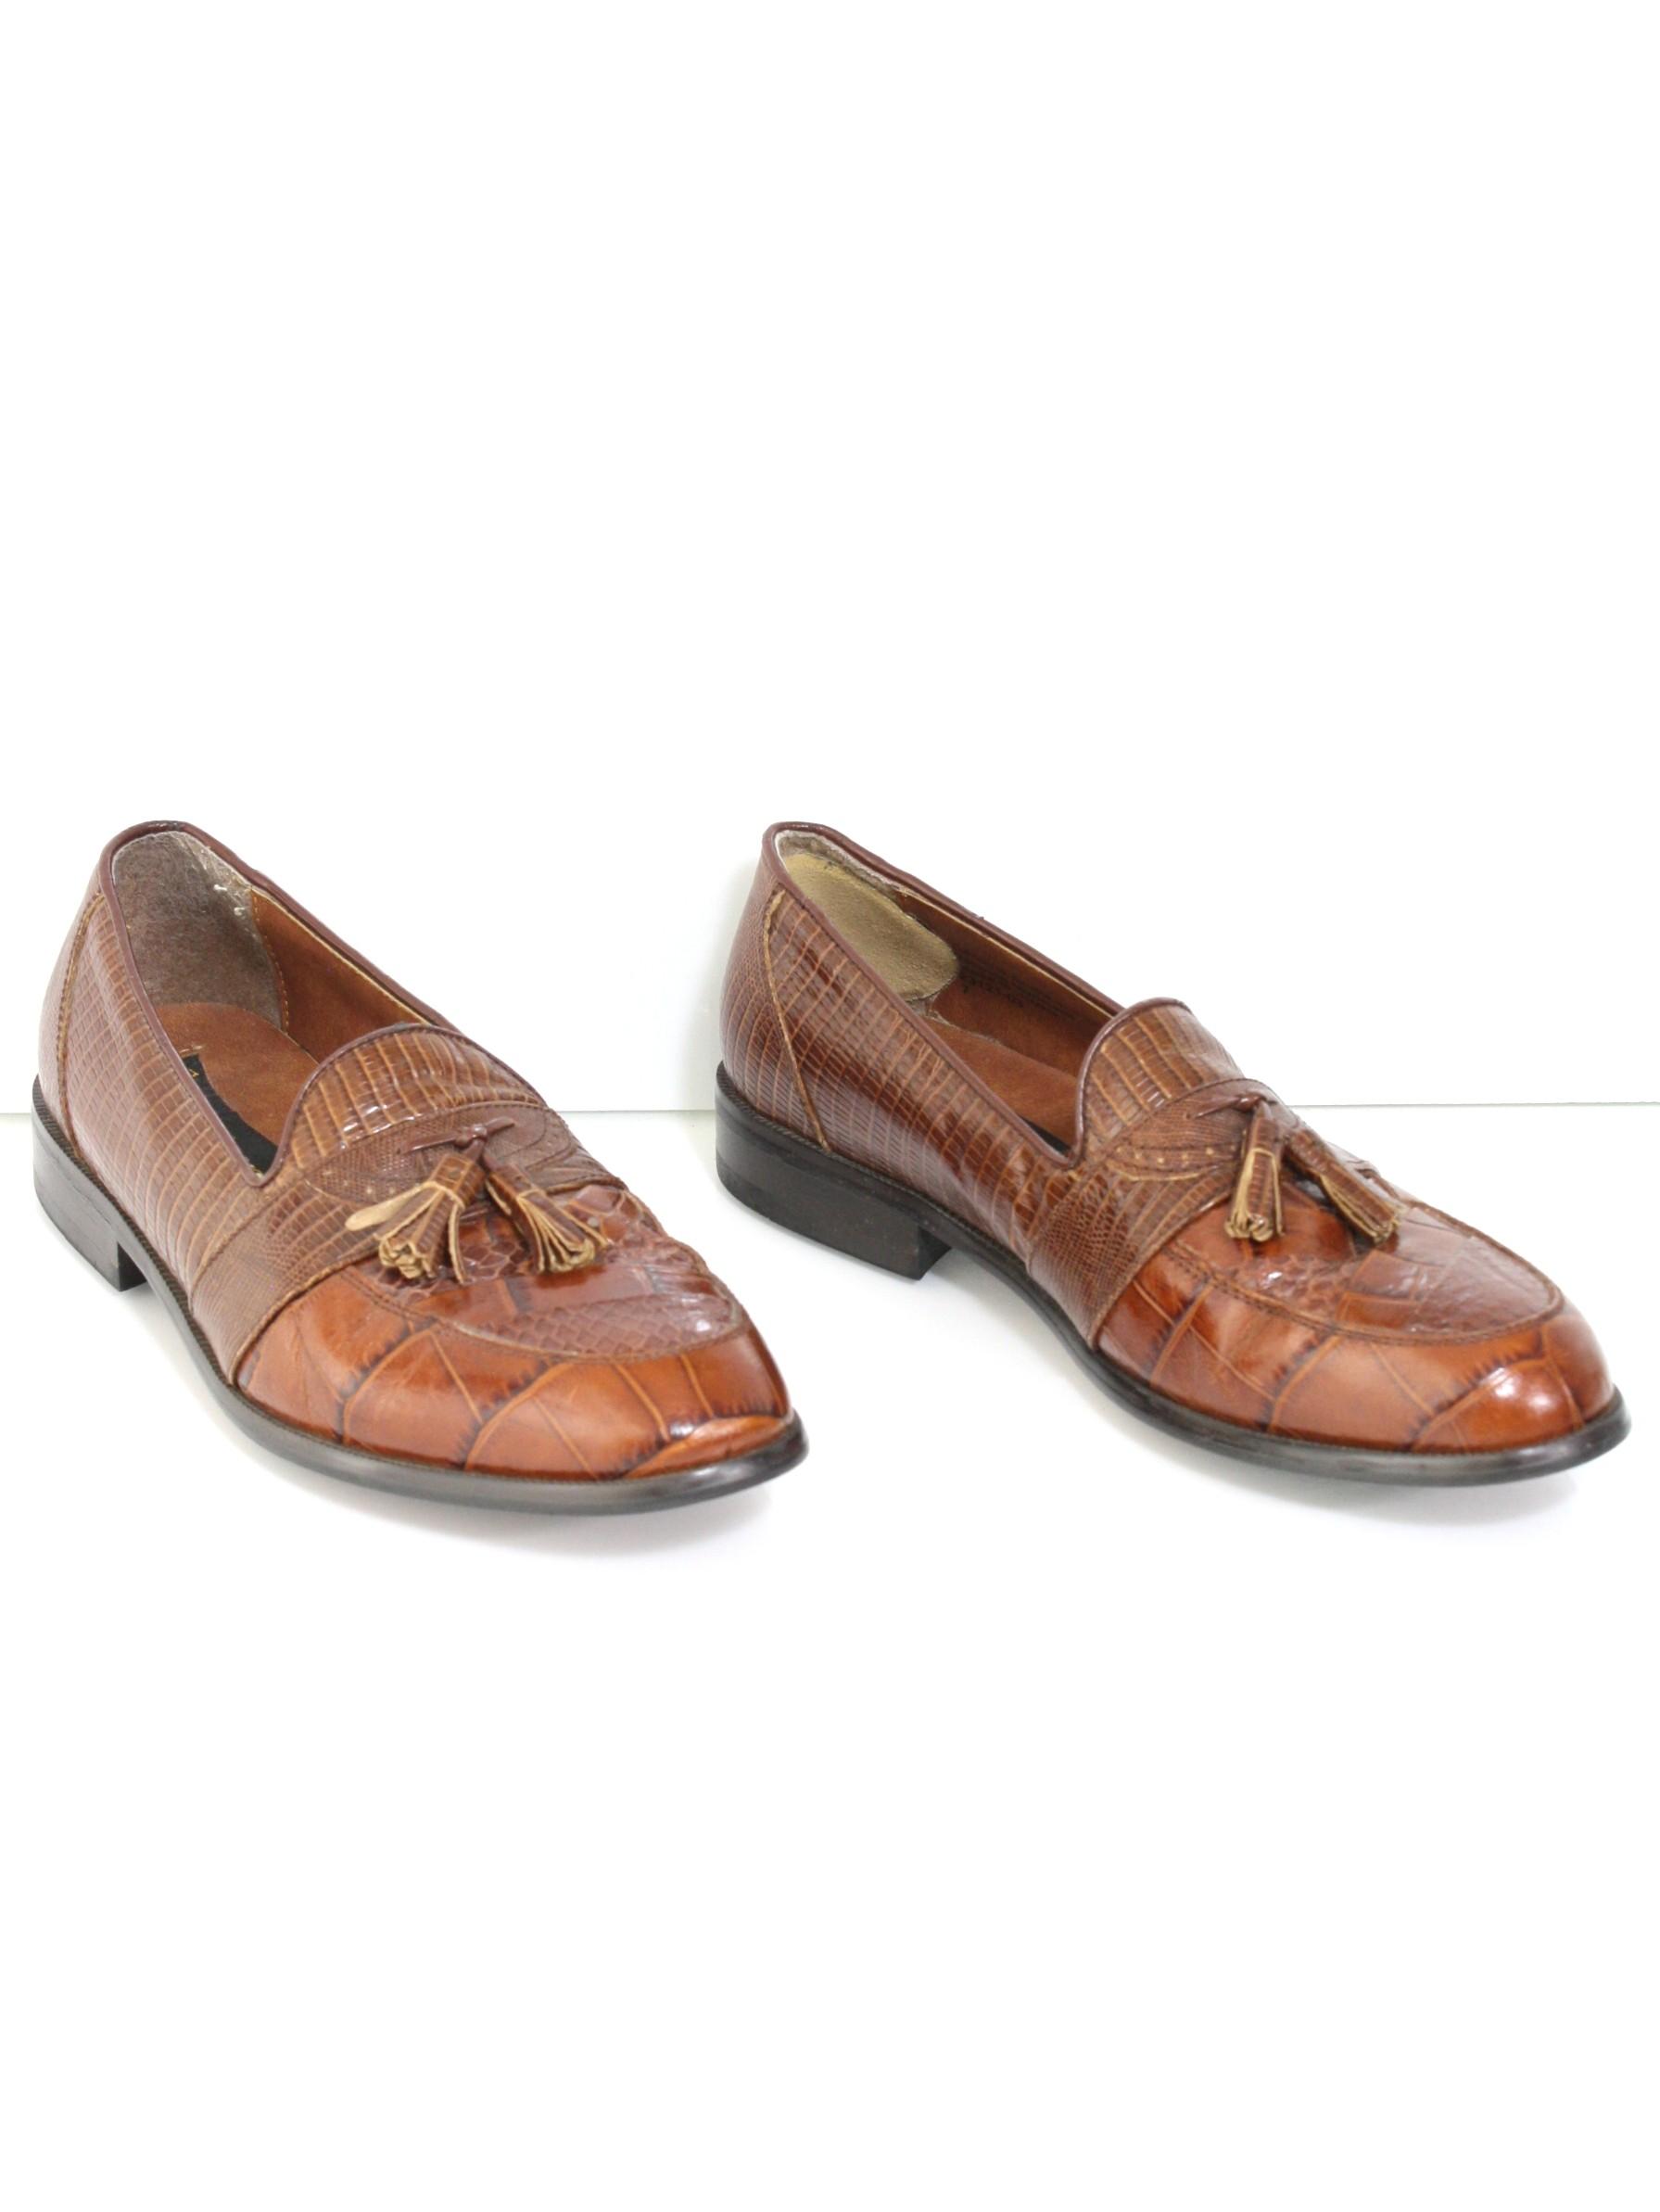 b8b31d941f5b 1980s Stacy Adams Shoes  80s -Stacy Adams- Mens brown snakeskin ...